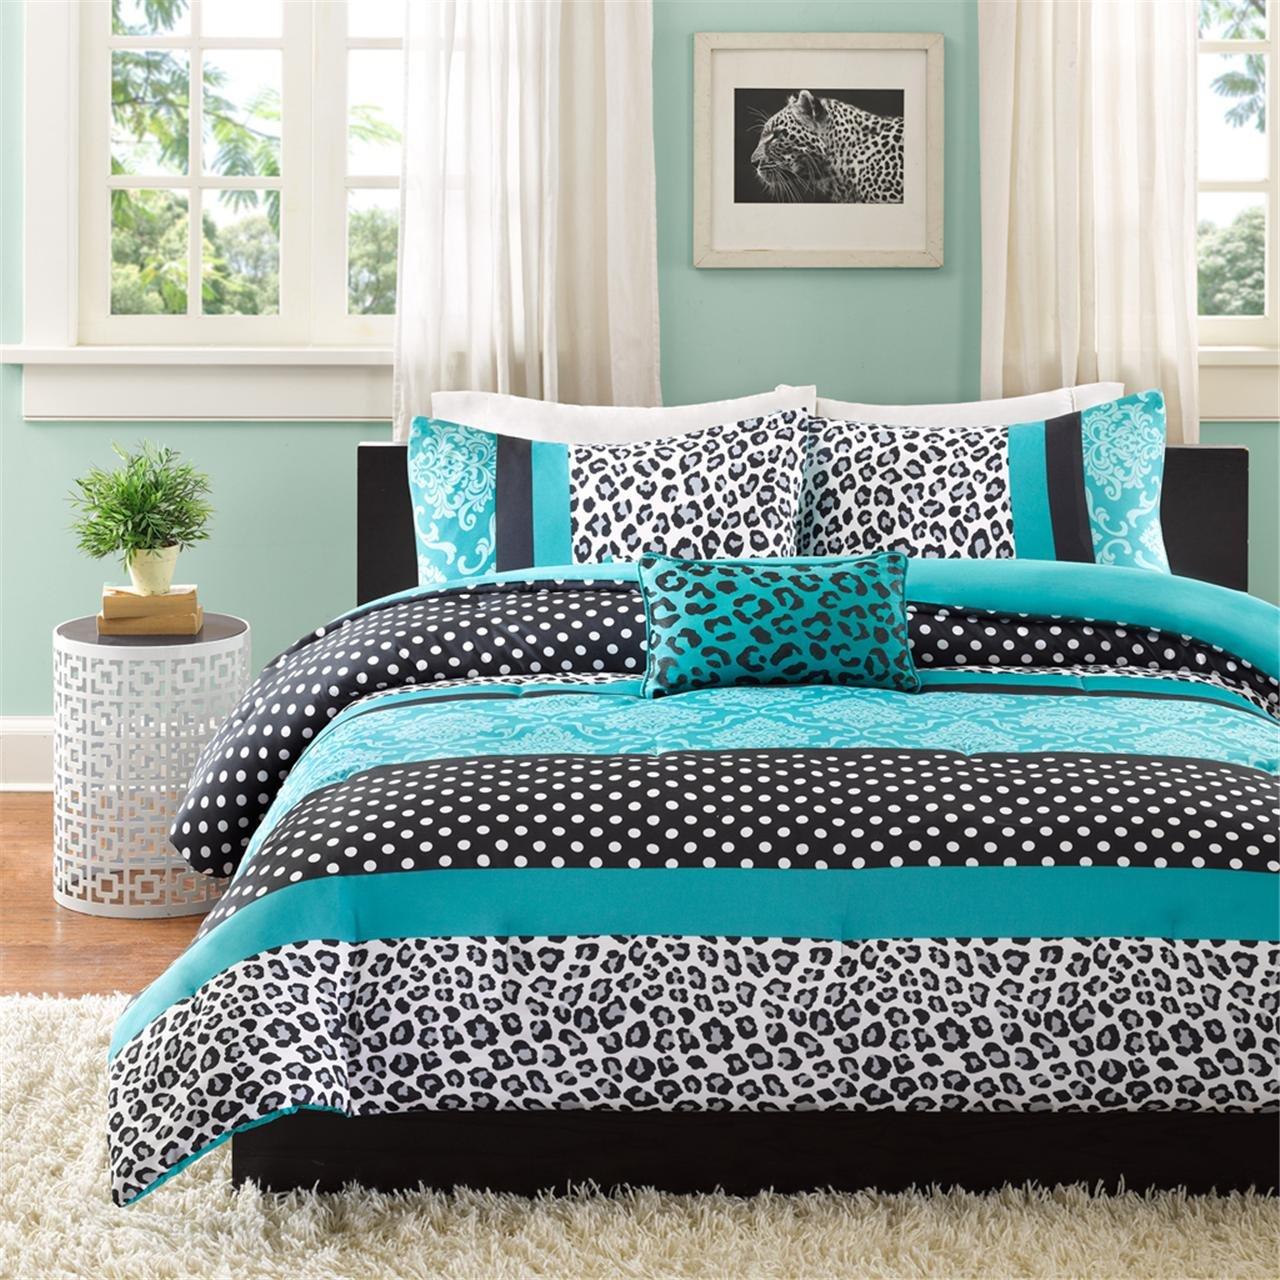 Mizone MZ10-225 Comforter Set, Twin/Twin XL, Teal